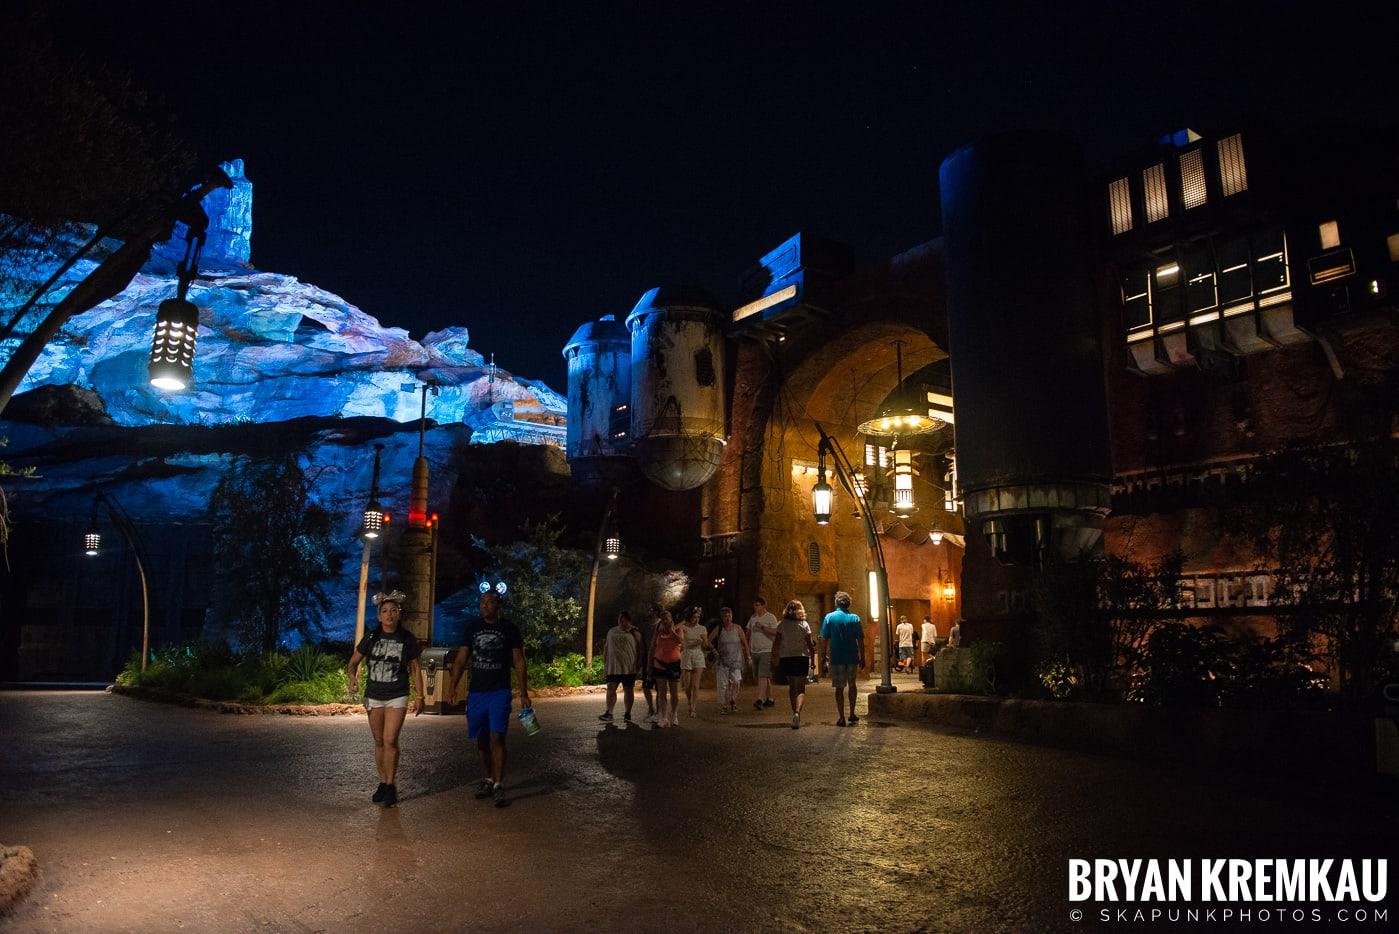 Walt Disney World Vacation: Day 5 (Animal Kingdom / Disney's Hollywood Studios) - 10.3.19 (39)